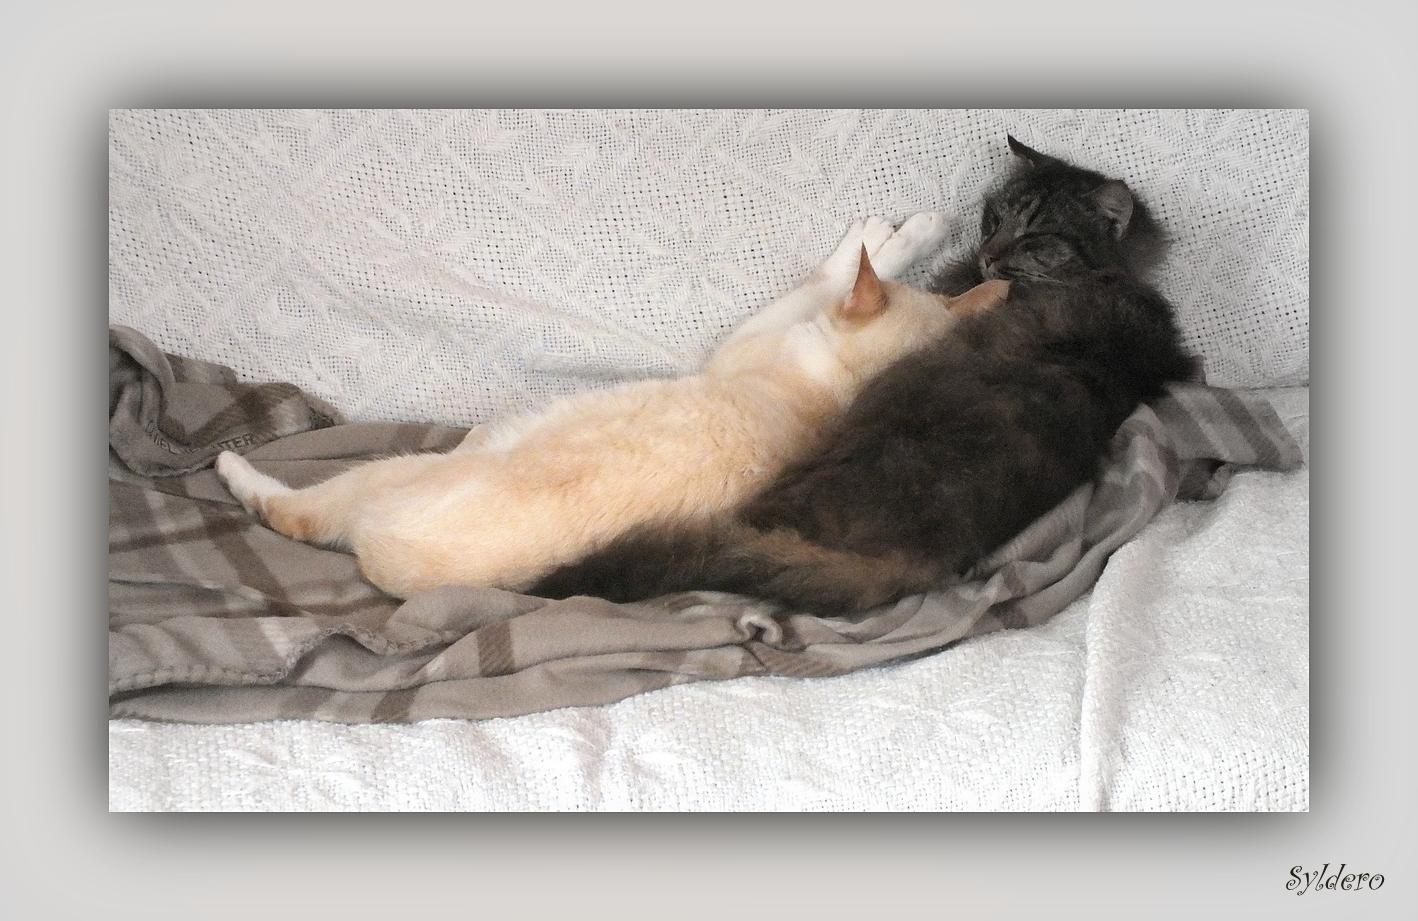 Mes deux chats en plein effort....